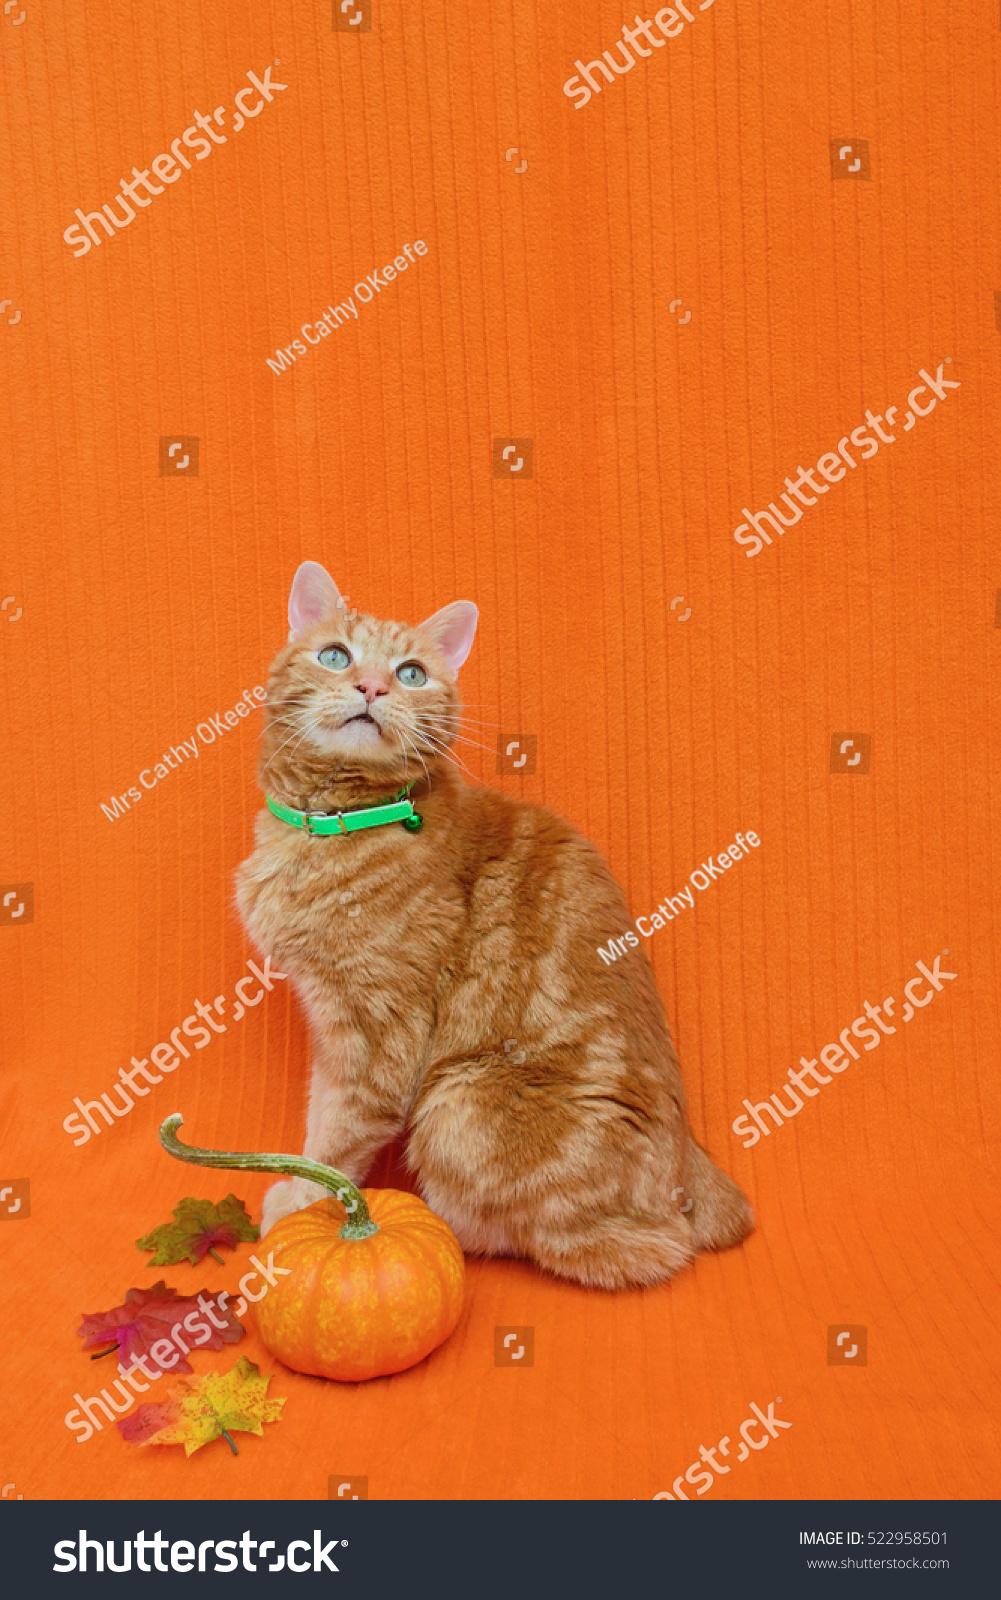 halloween thanksgiving pet theme cat has stock photo (edit now